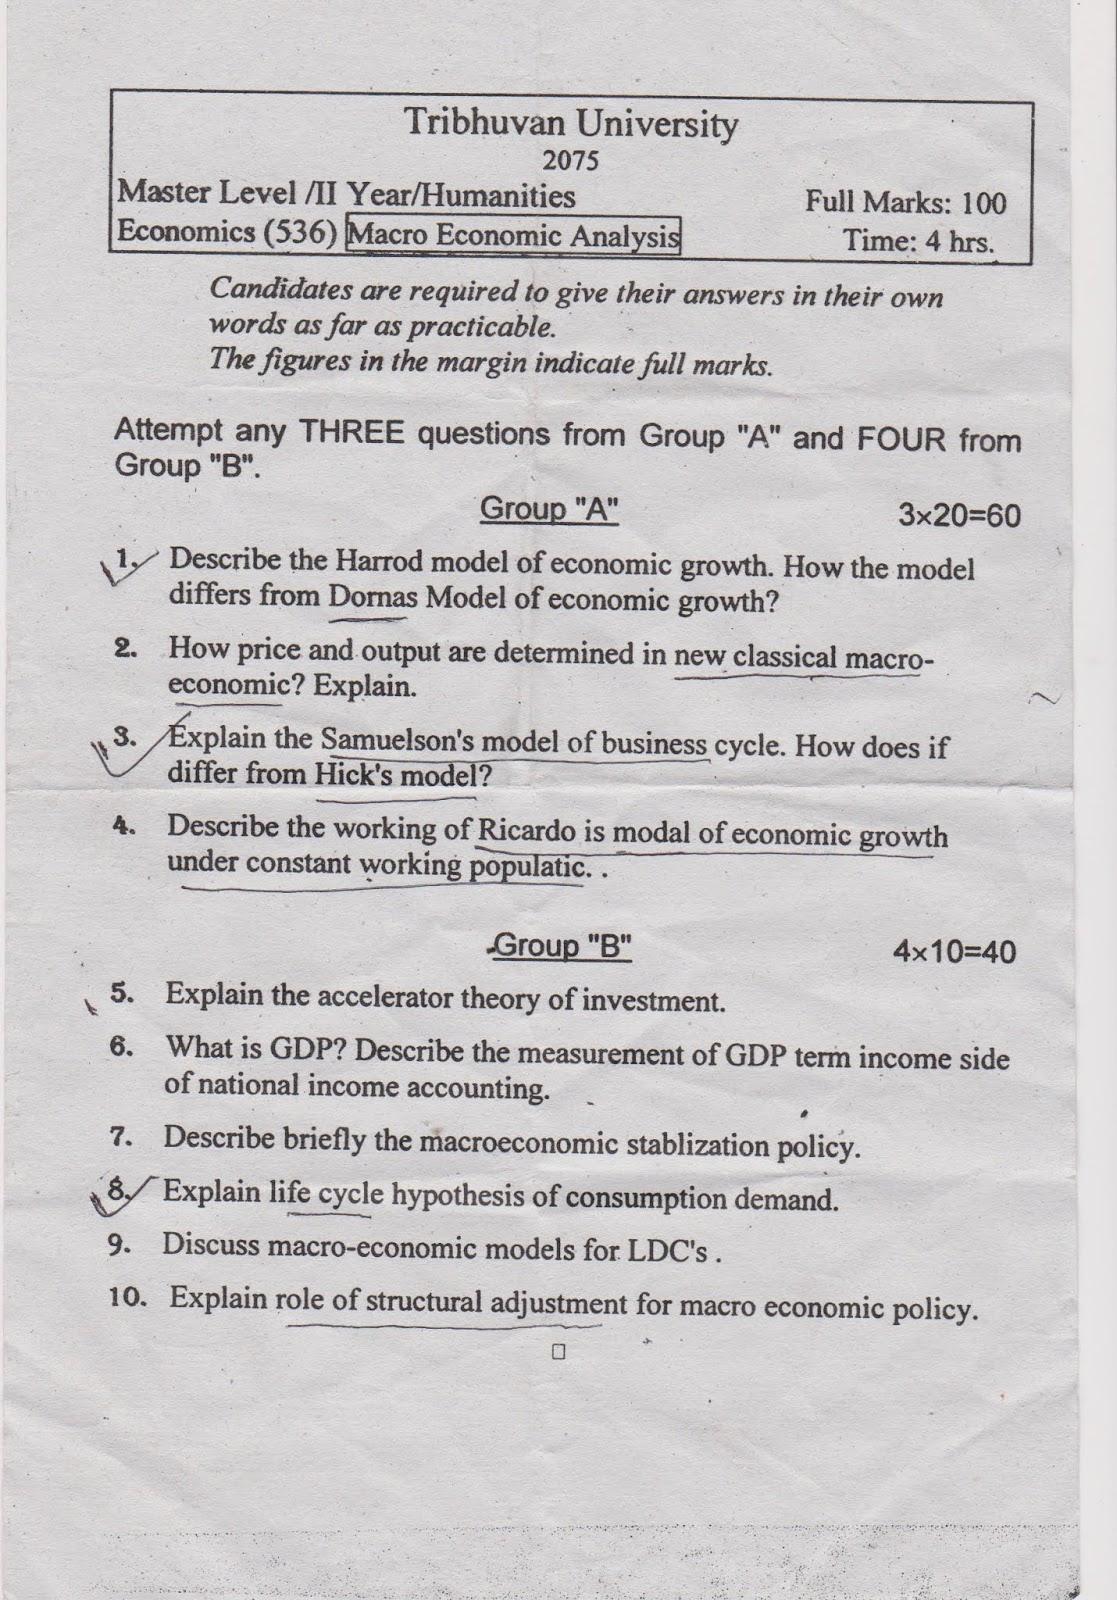 Economics-536-Macro-Economic-Analysis-Question-Paper-2075-Master-Level-II-Year-Humanities-TU